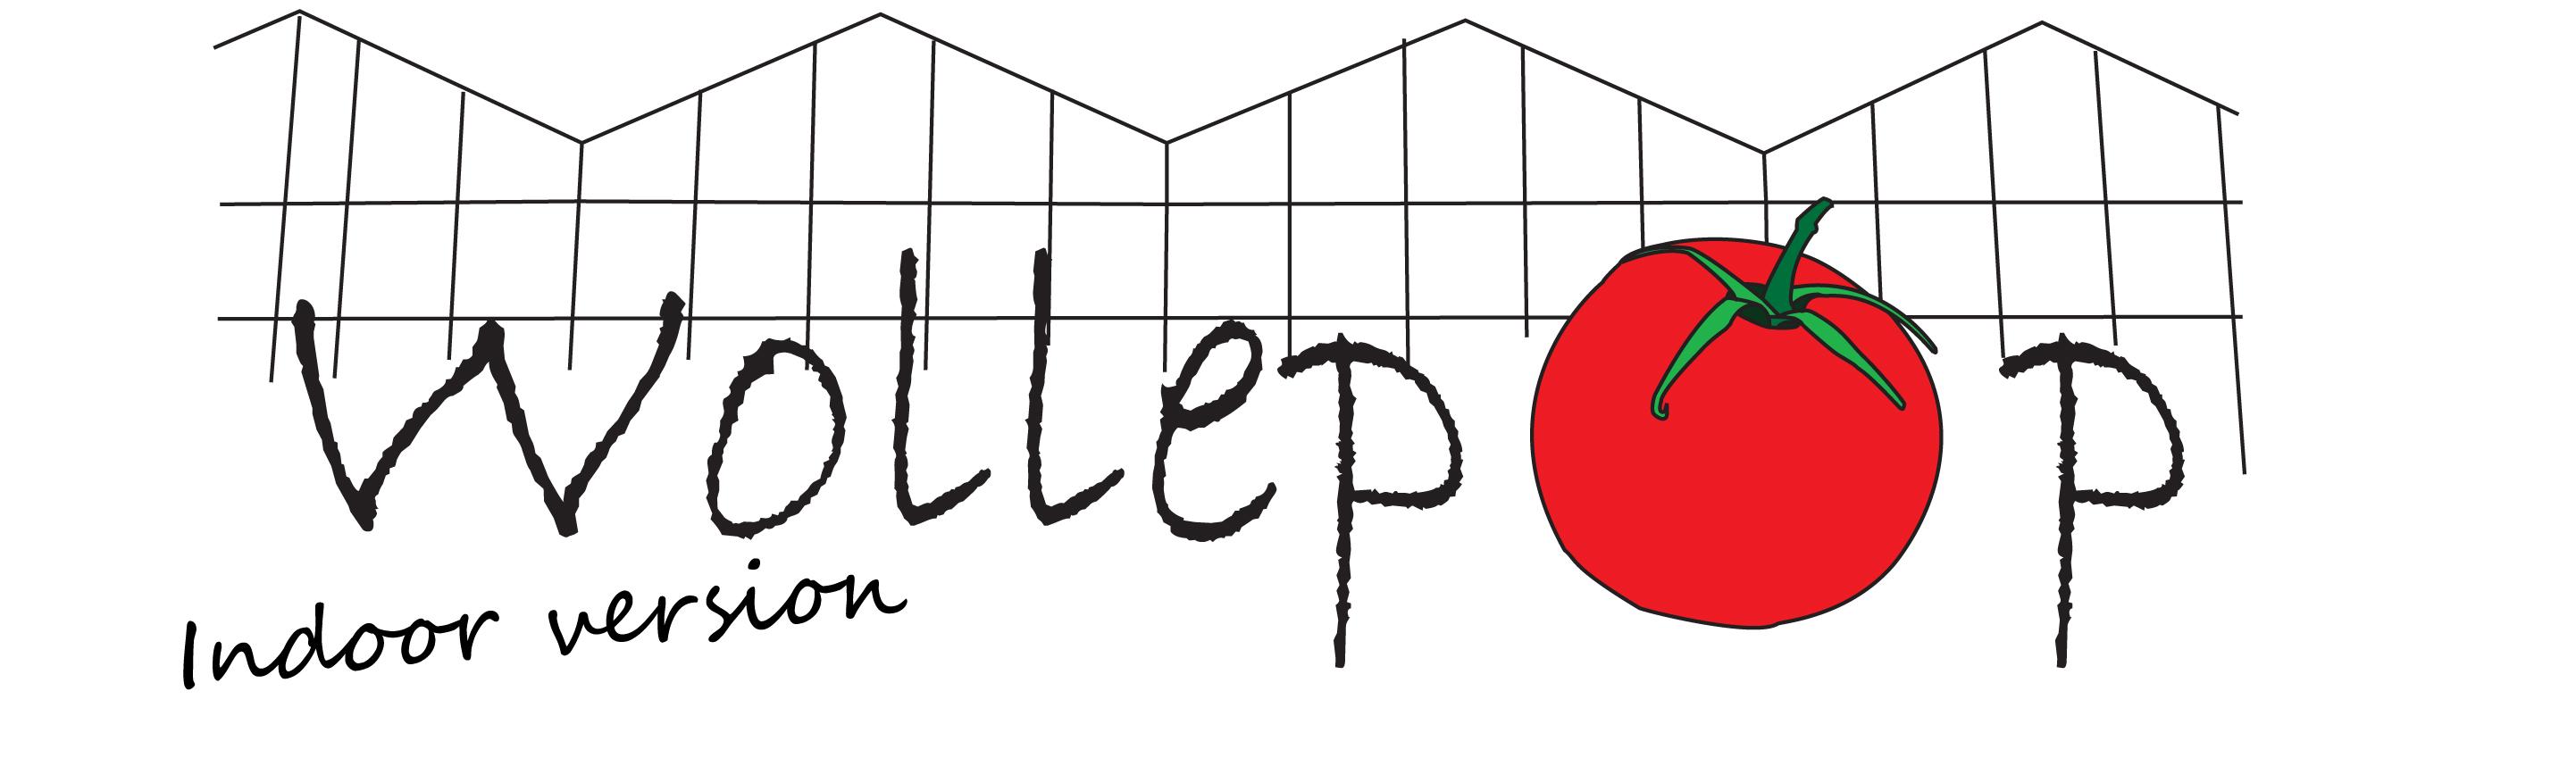 Bevrijdingsfestival Wollepop 2020